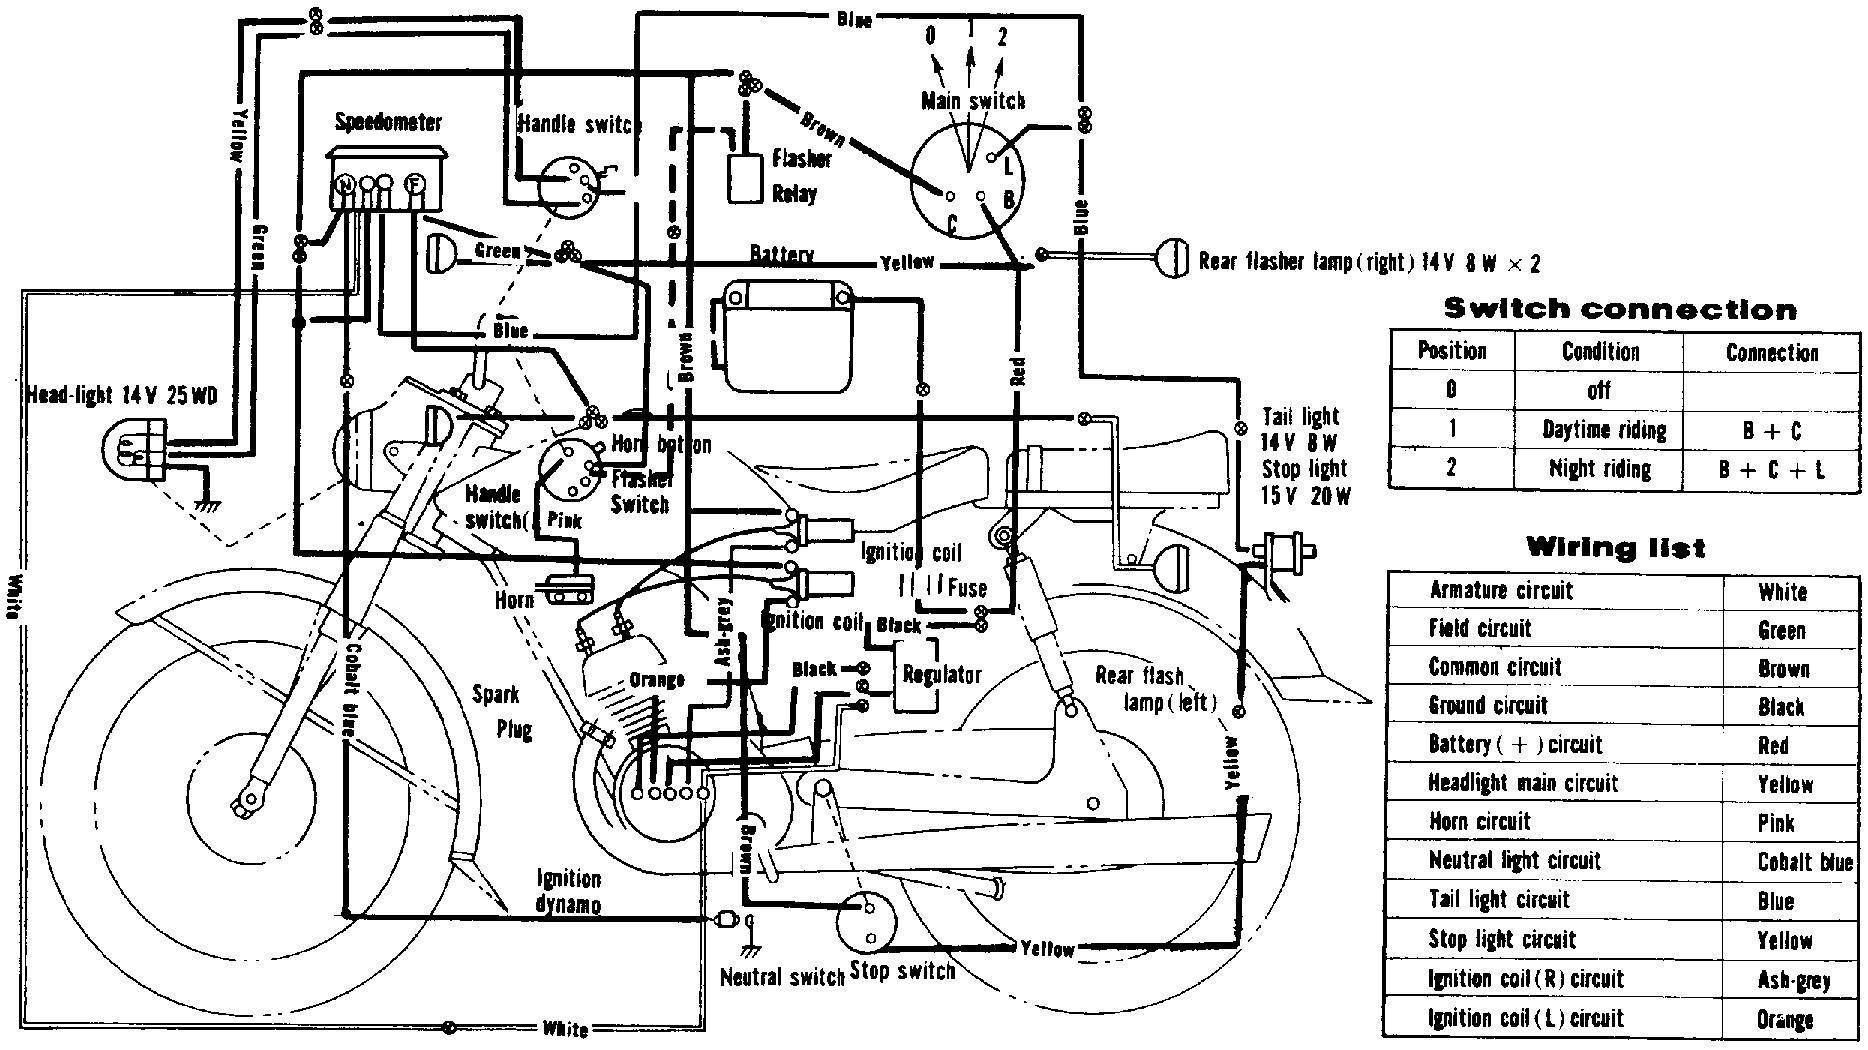 medium resolution of yamaha l2 wiring diagram wiring diagrams for arctic cat wiring diagram yamaha l2 wiring diagram